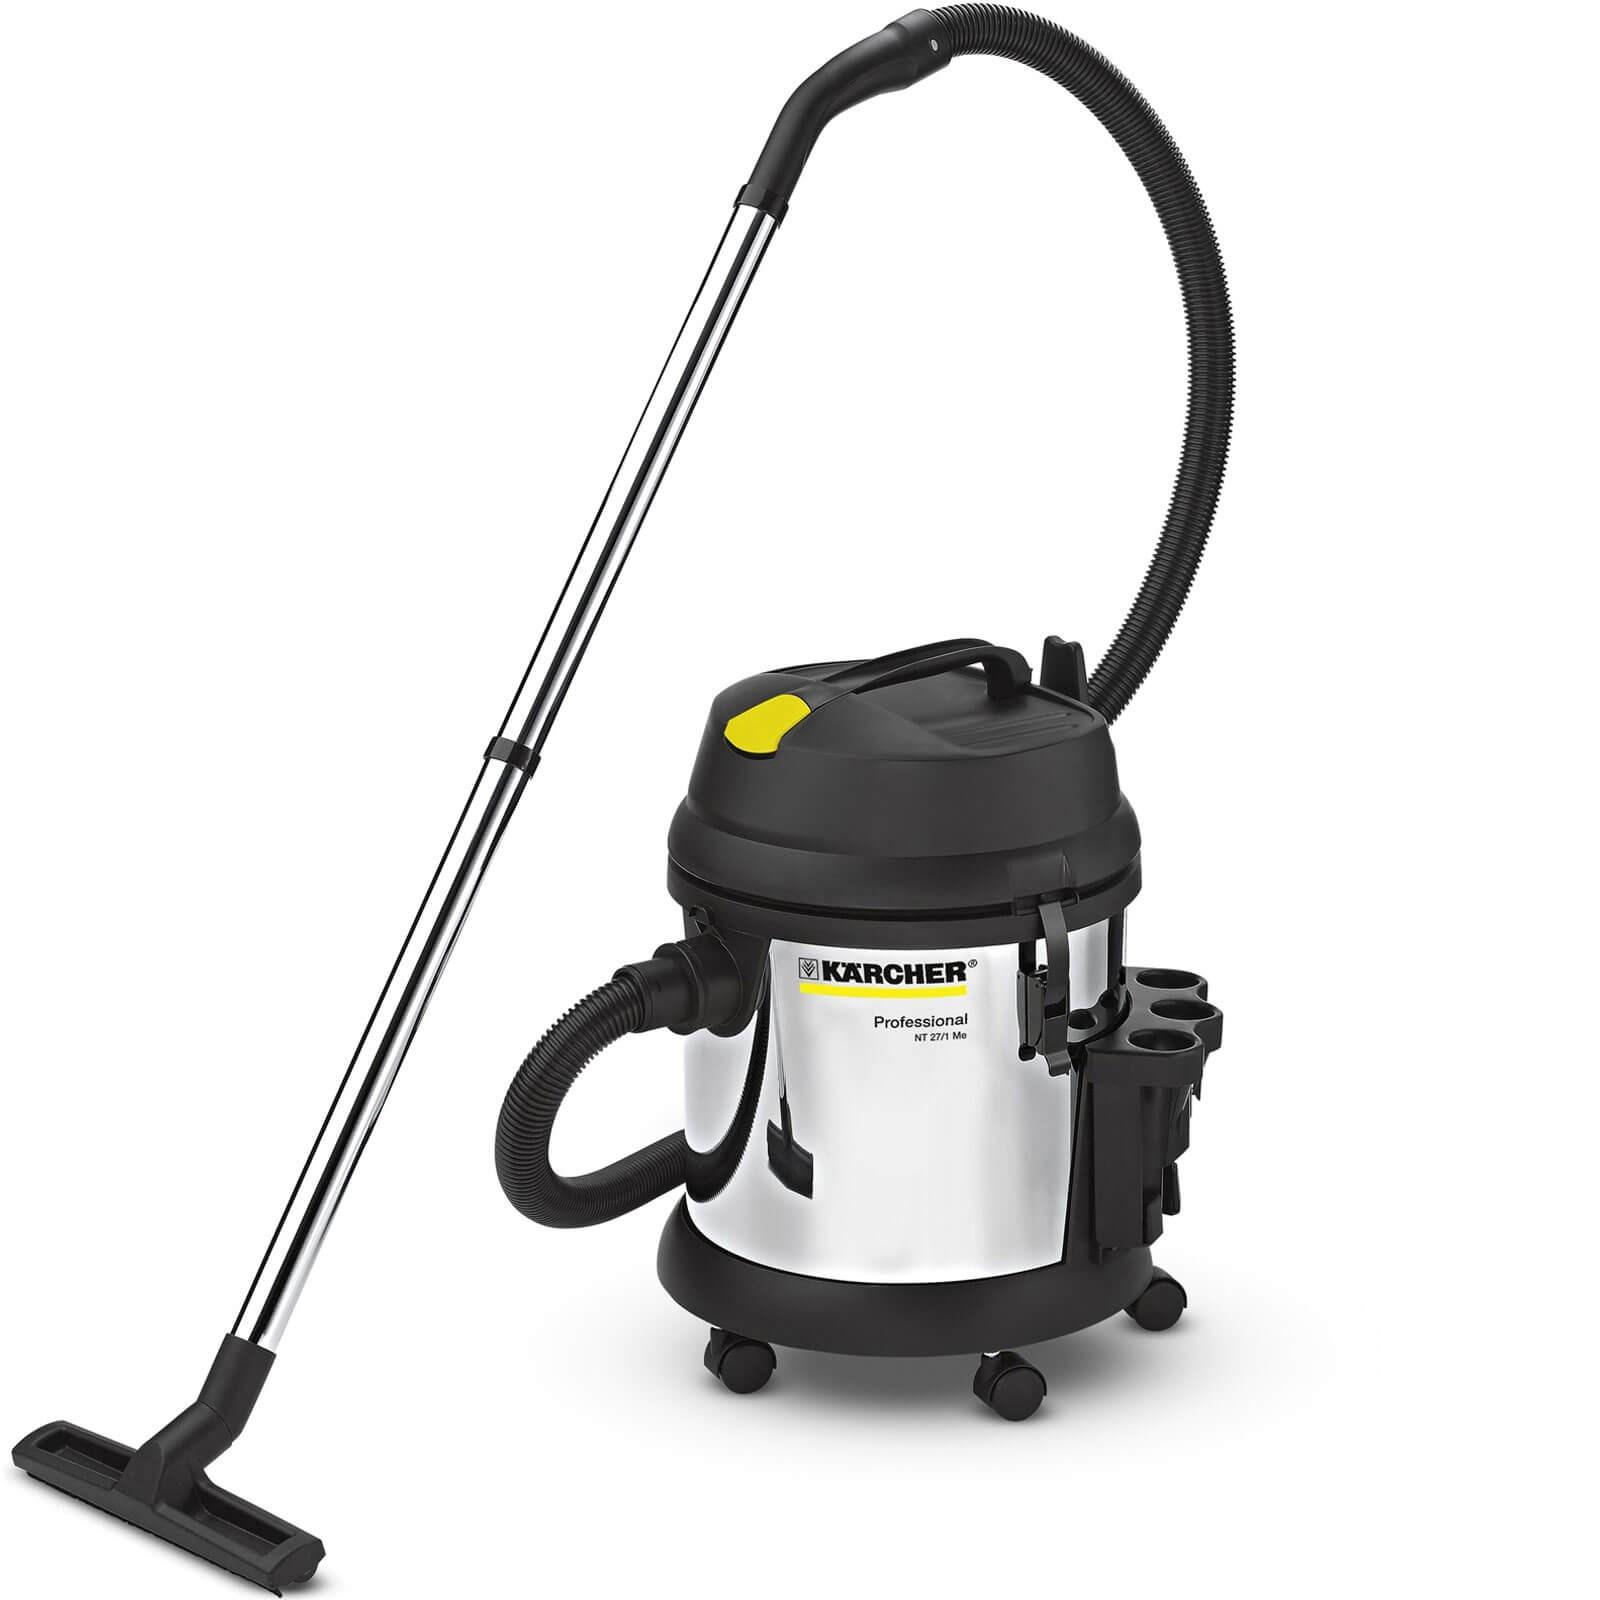 Karcher Nt 27 1 Me Professional Metal Wet Dry Vacuum Cleaner Black Decker And